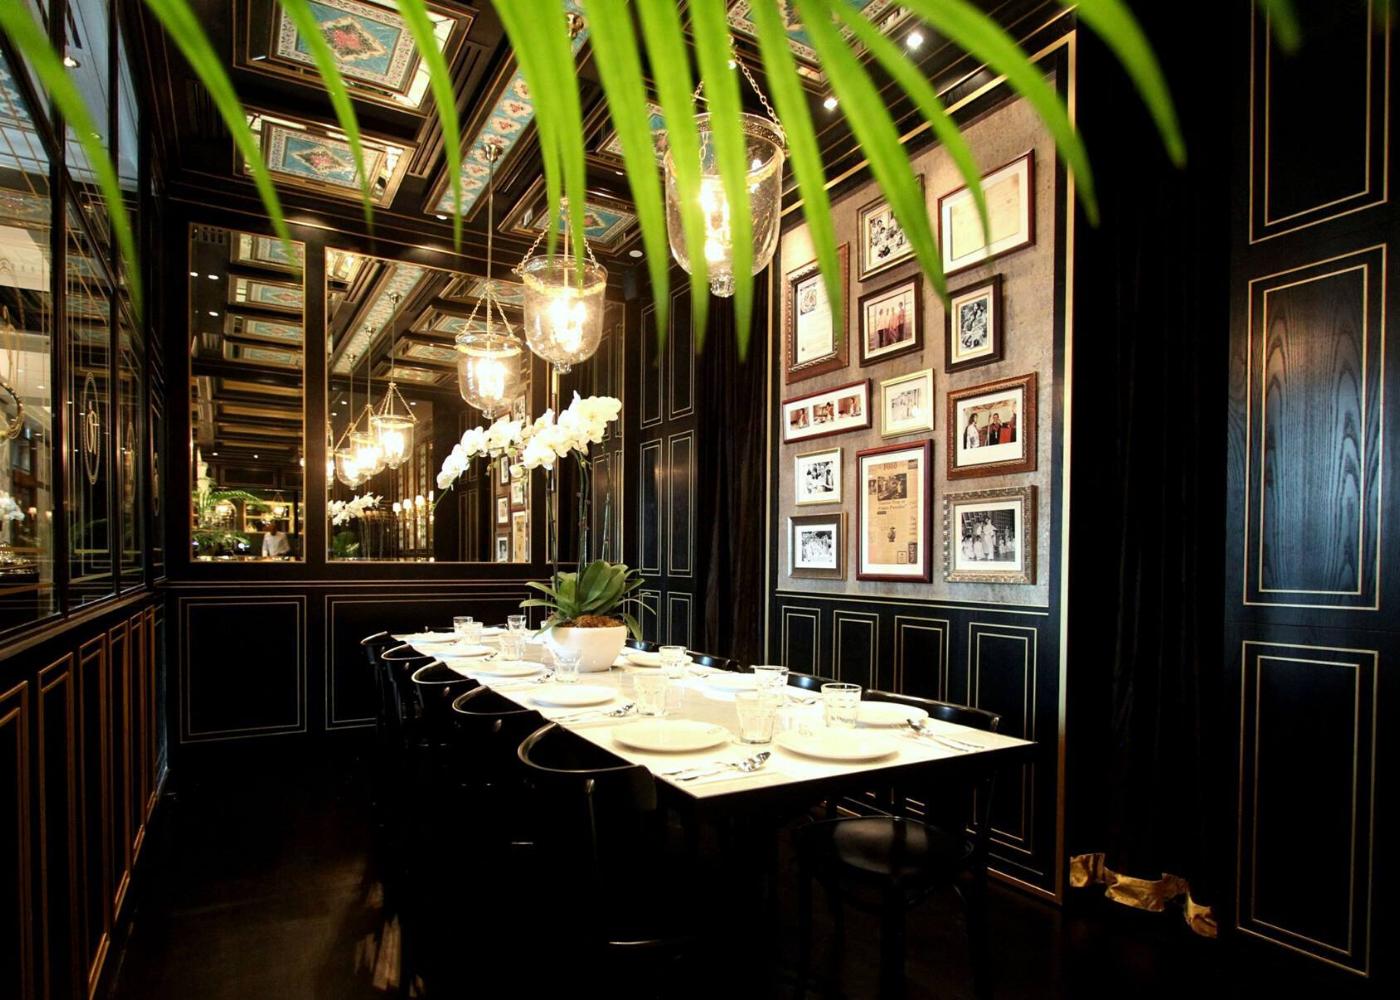 National Kitchen by Violet Oon | Best restaurants Singapore